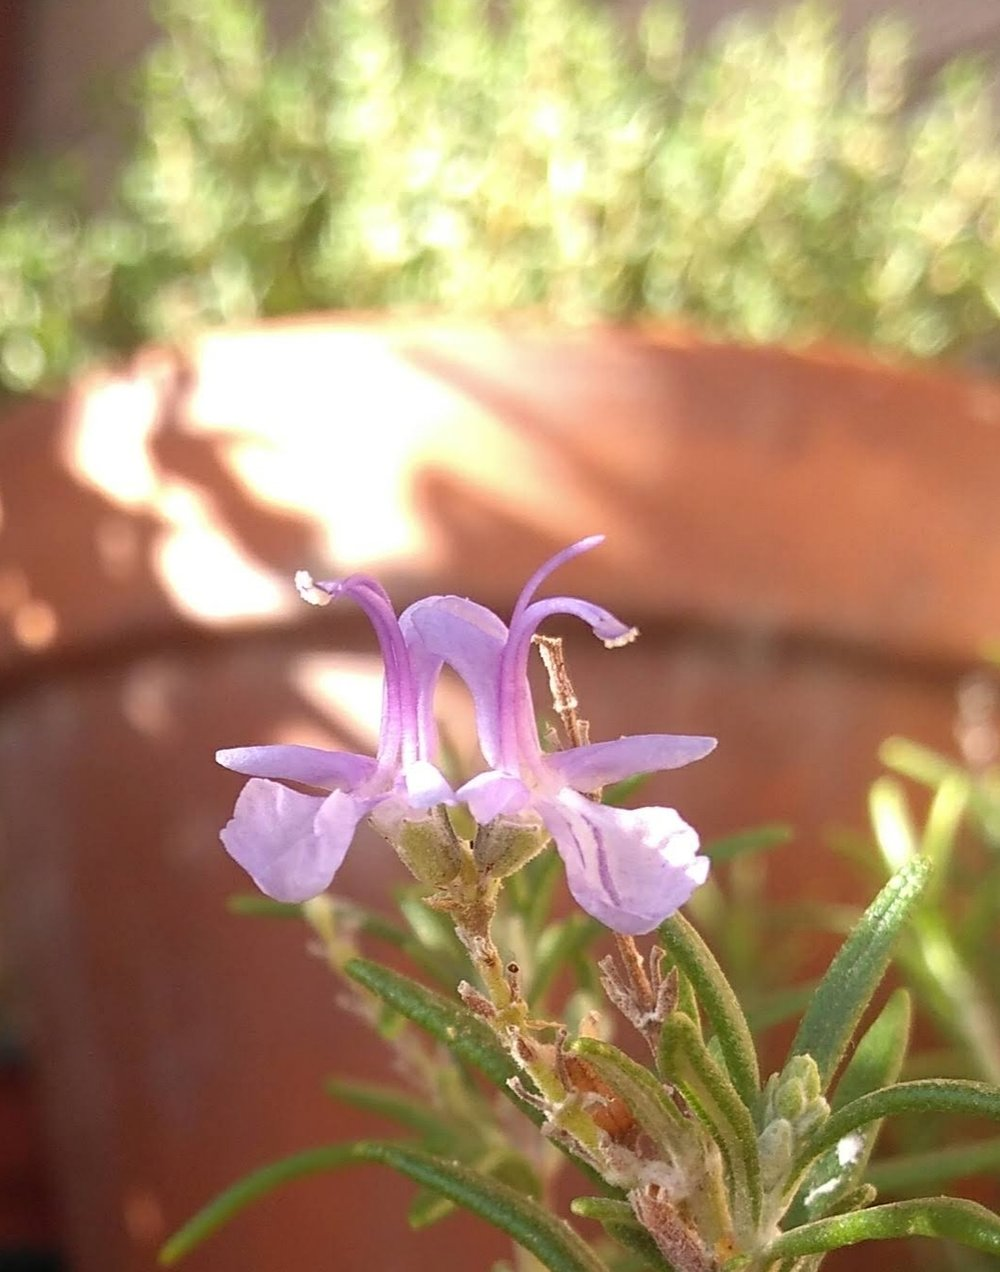 La bella flor del  romero ,   cuya forma se asemeja a la de una orquídea en miniatura.